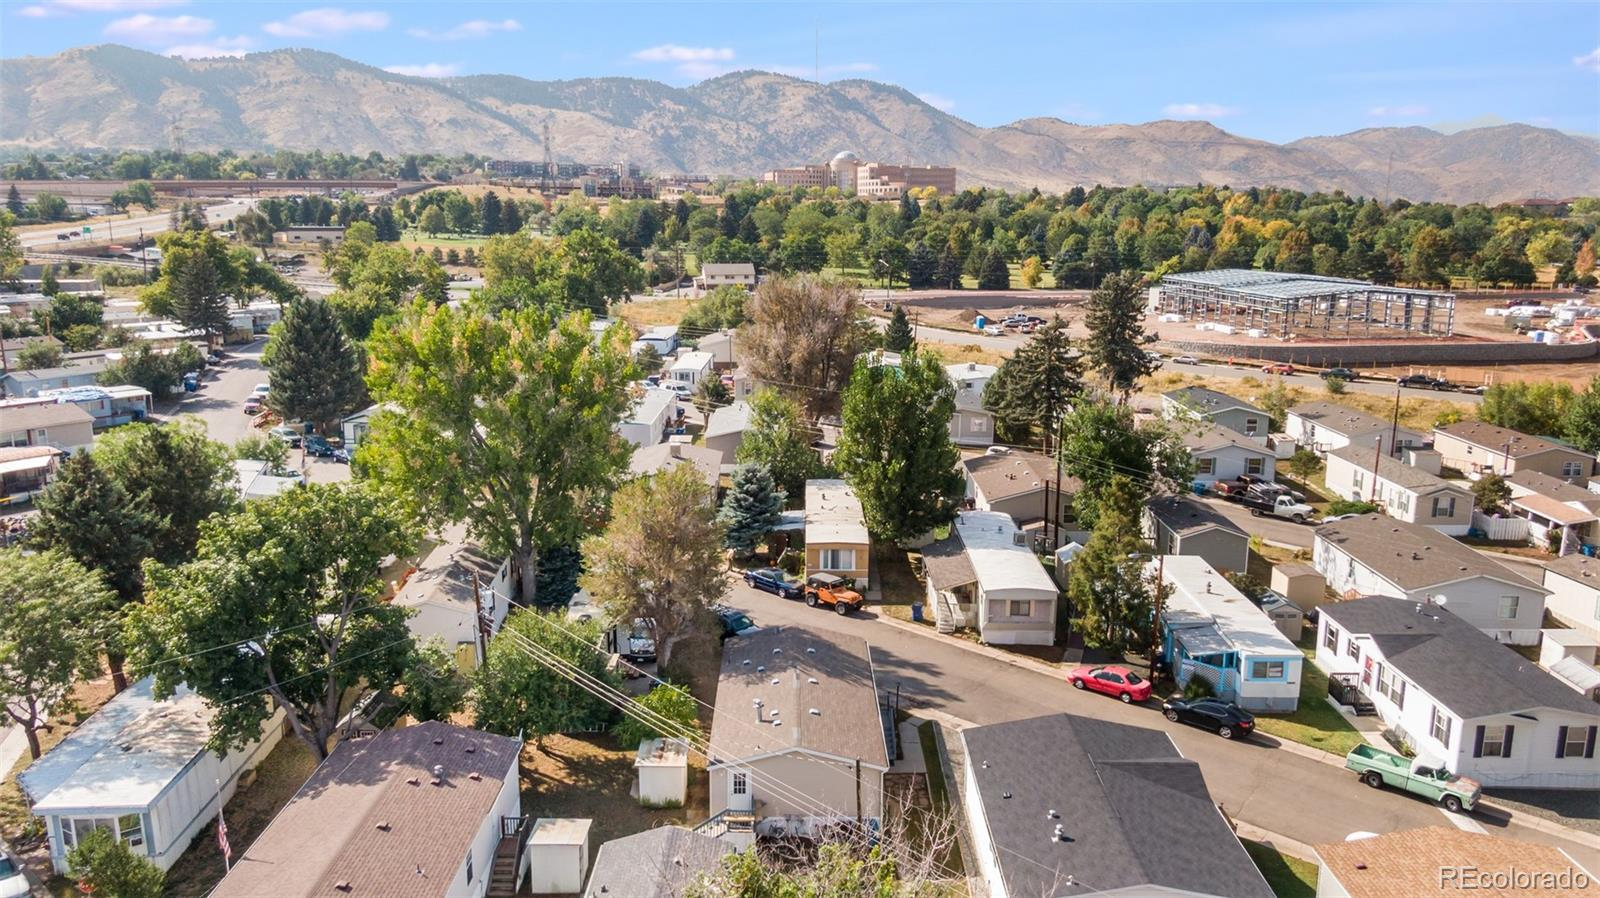 17190 Mt. Vernon Road, Golden, CO